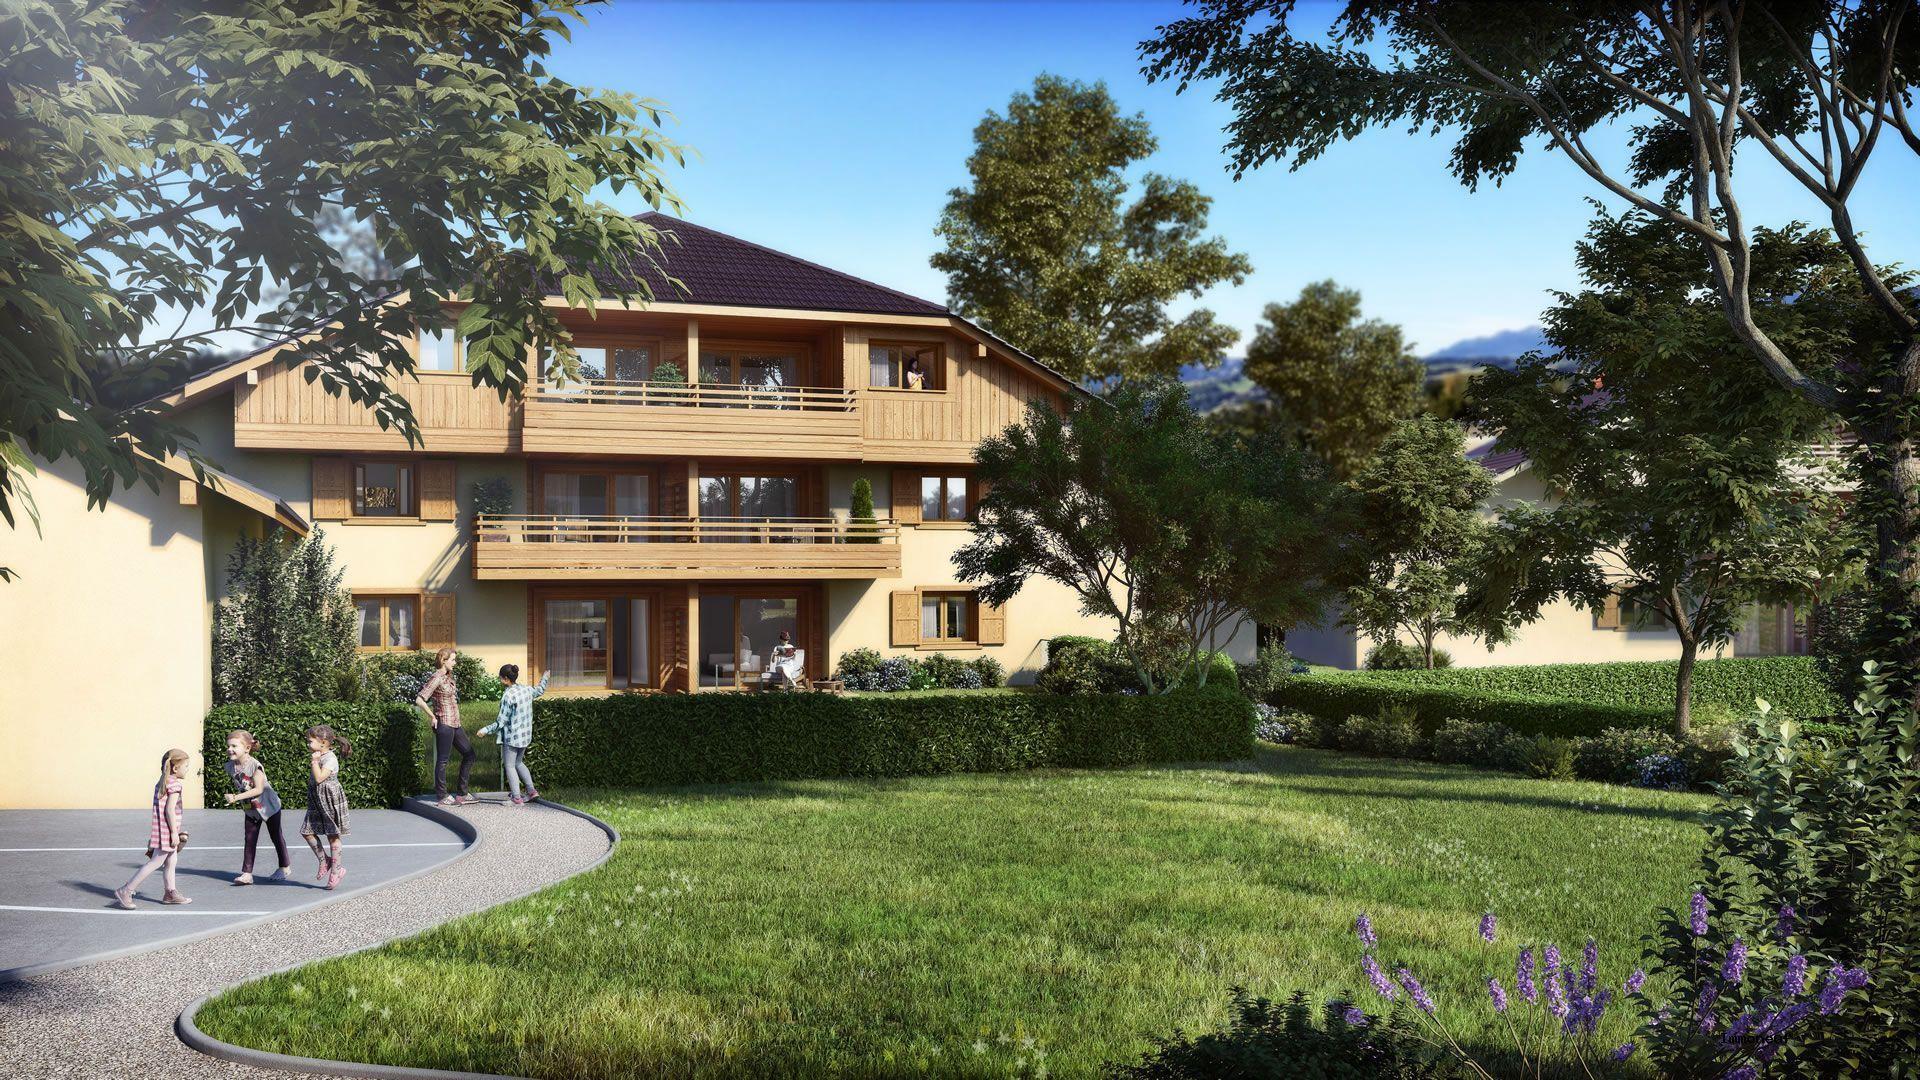 Annonce vente appartement cornier 74800 63 m 229 000 for Annonce vente appartement